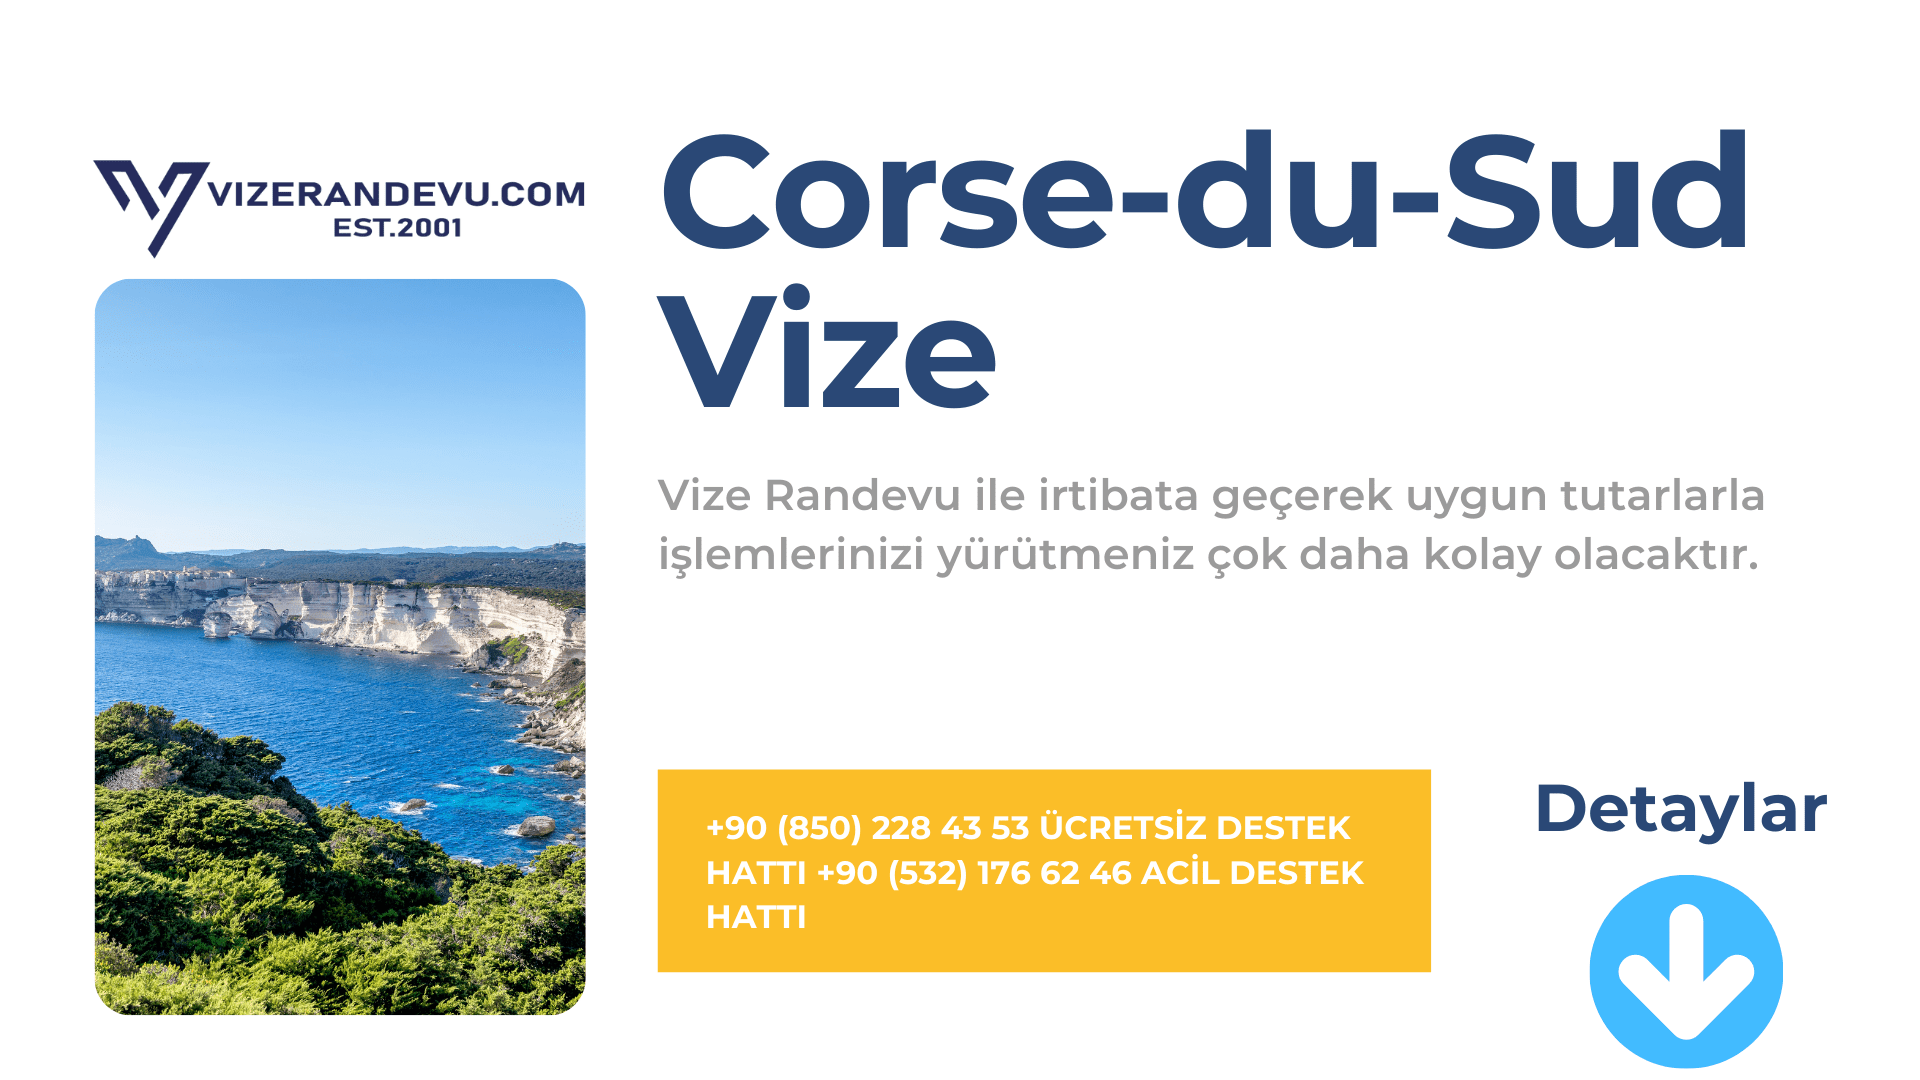 Fransa Corse-du-Sud Vize Başvurusu